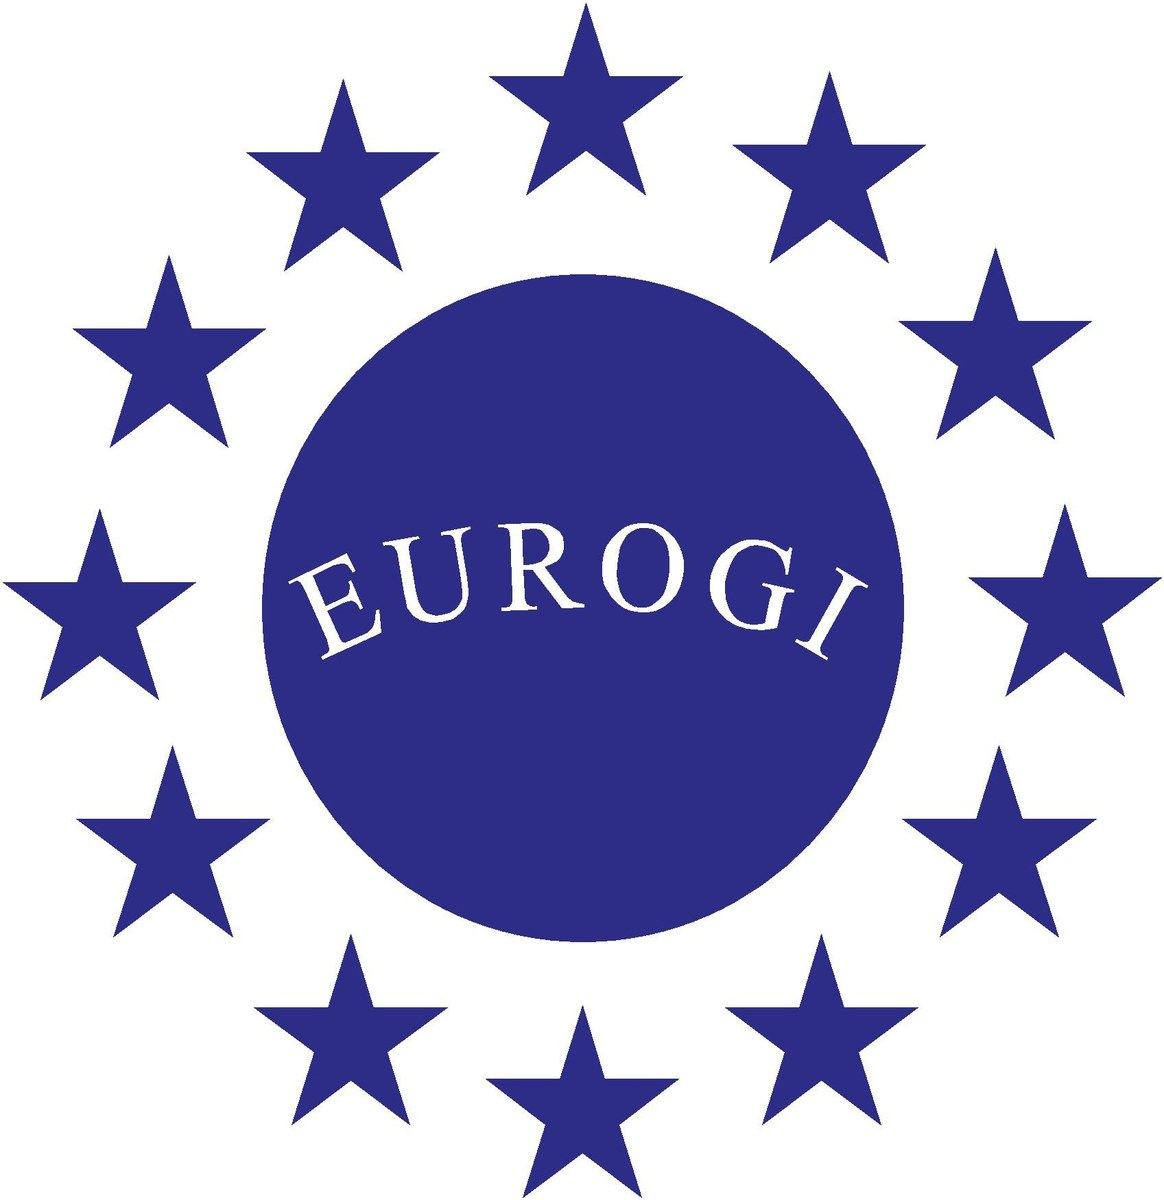 EUROGI.jpg